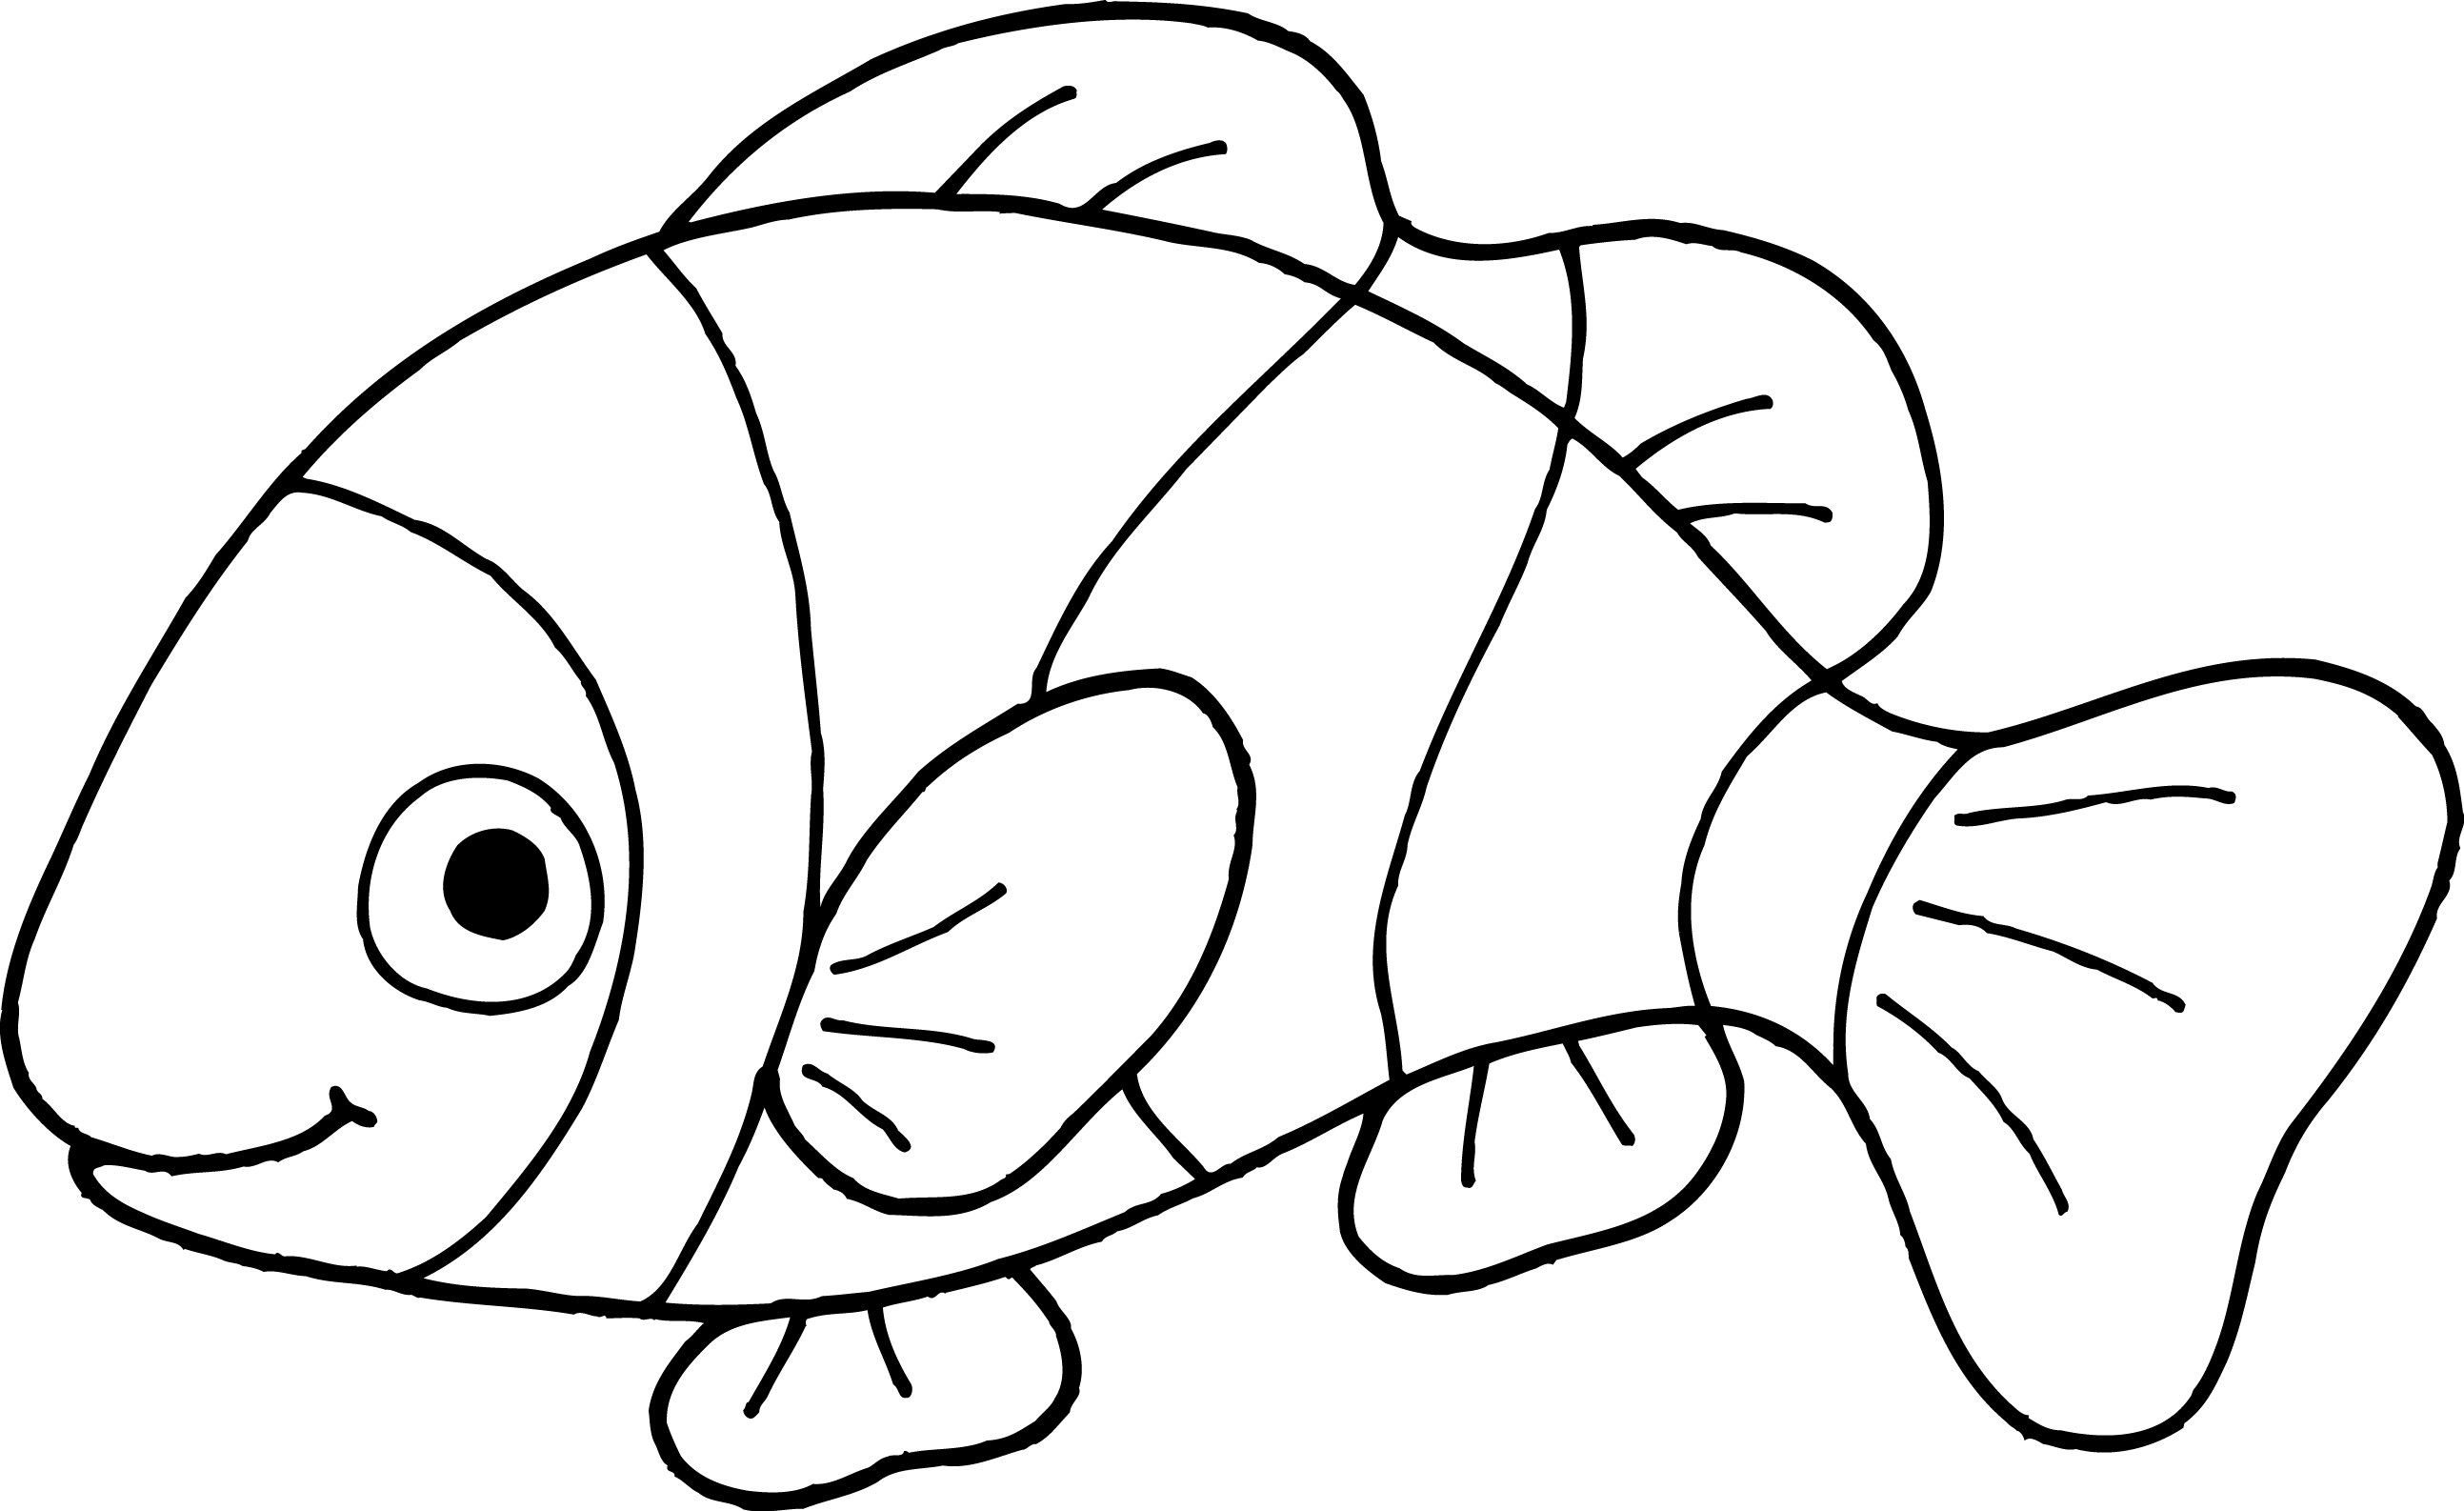 Goldfish Clipart Black And | Clipart Panda - Free Clipart Images for Goldfish Clipart Black And White  110ylc